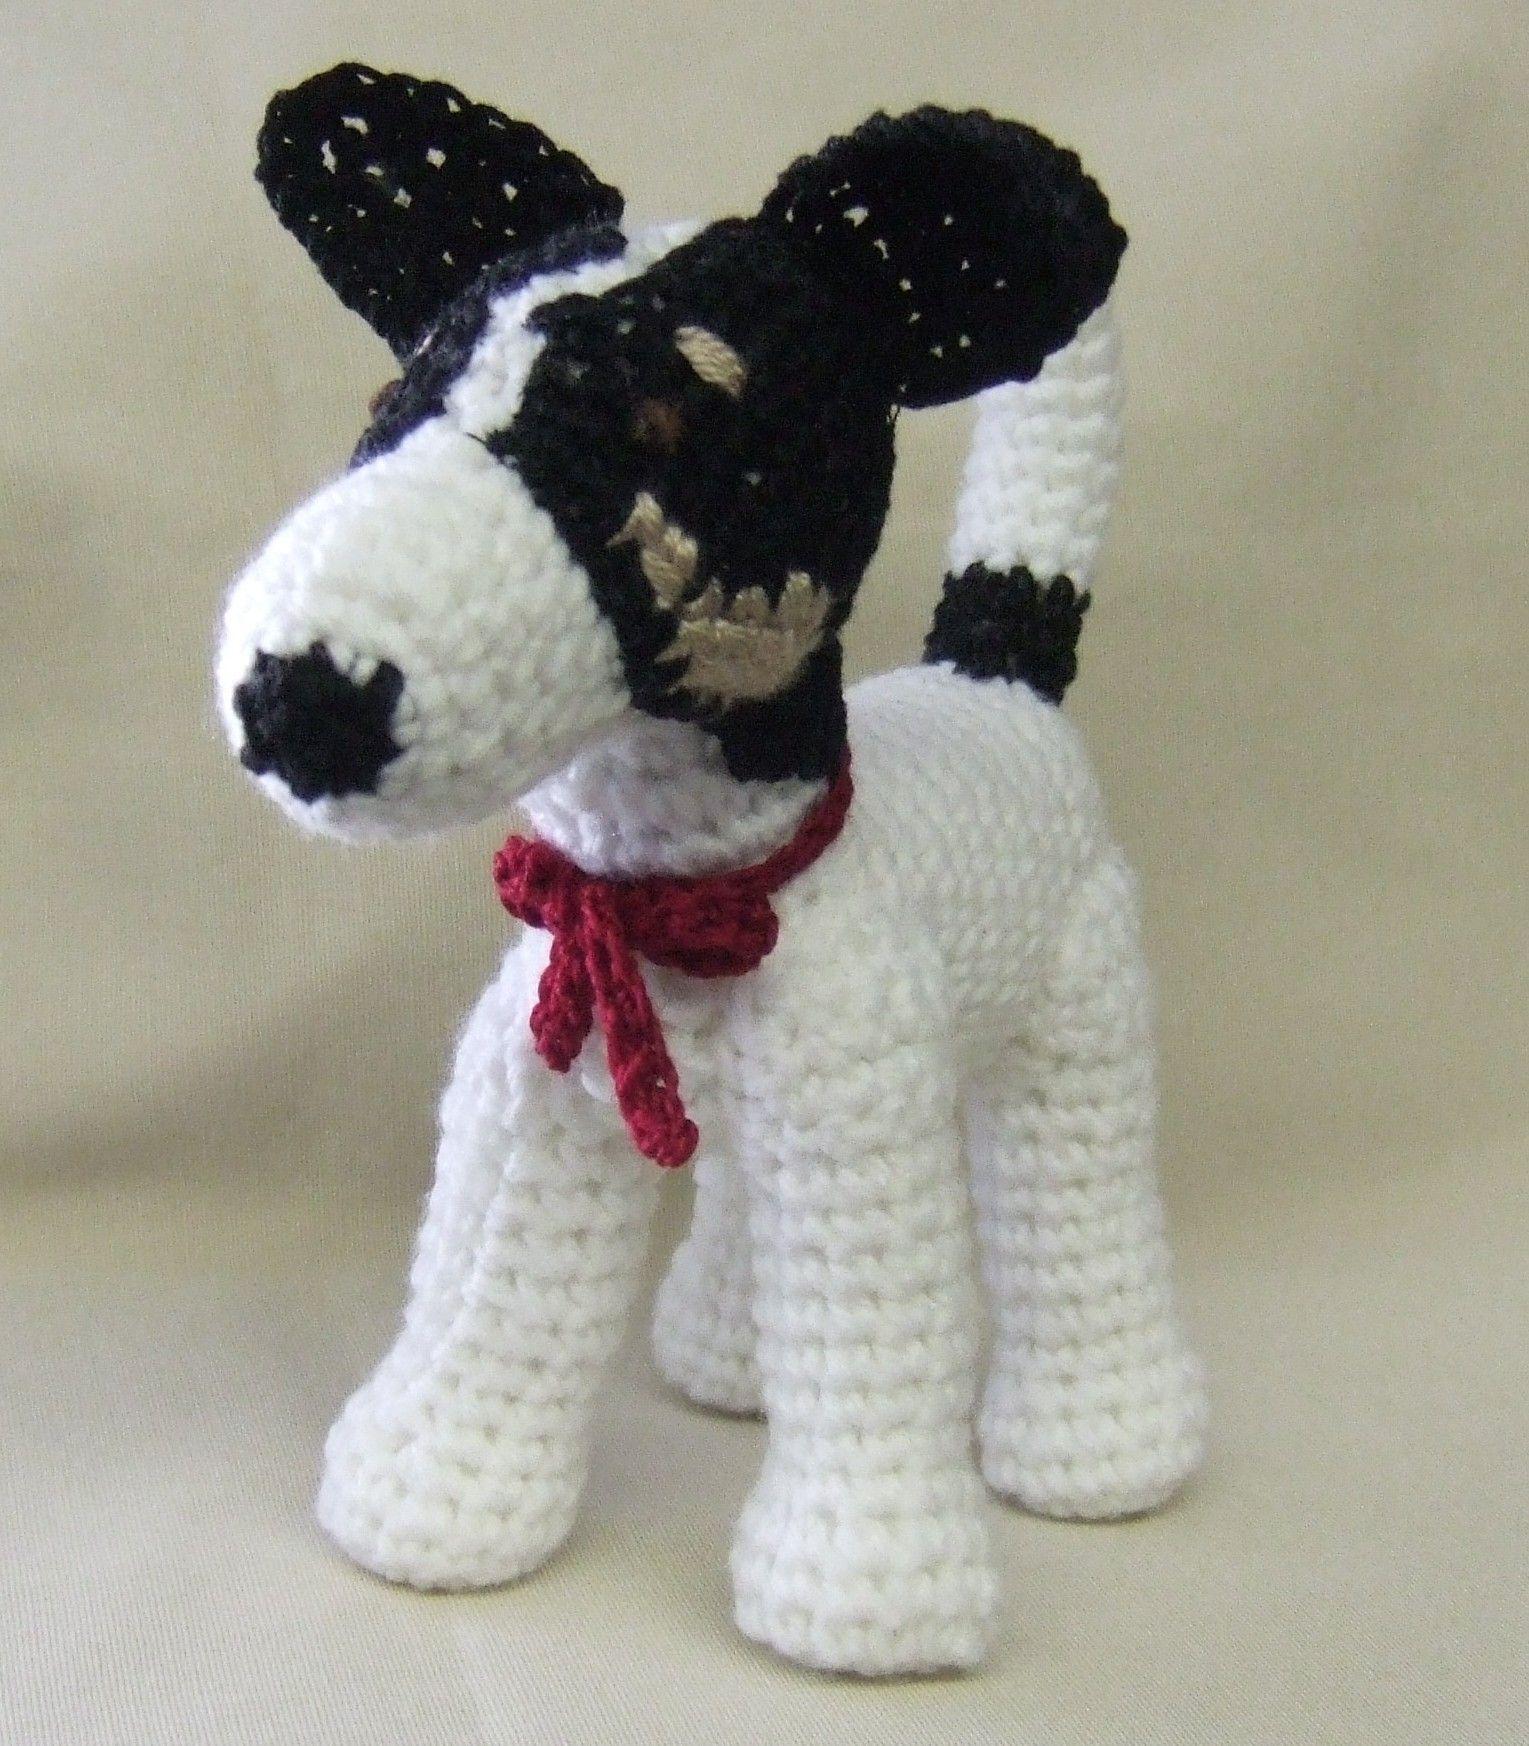 PROJECT #027: AMIGURUMI DOG WITH DIY FUR | 1746x1529